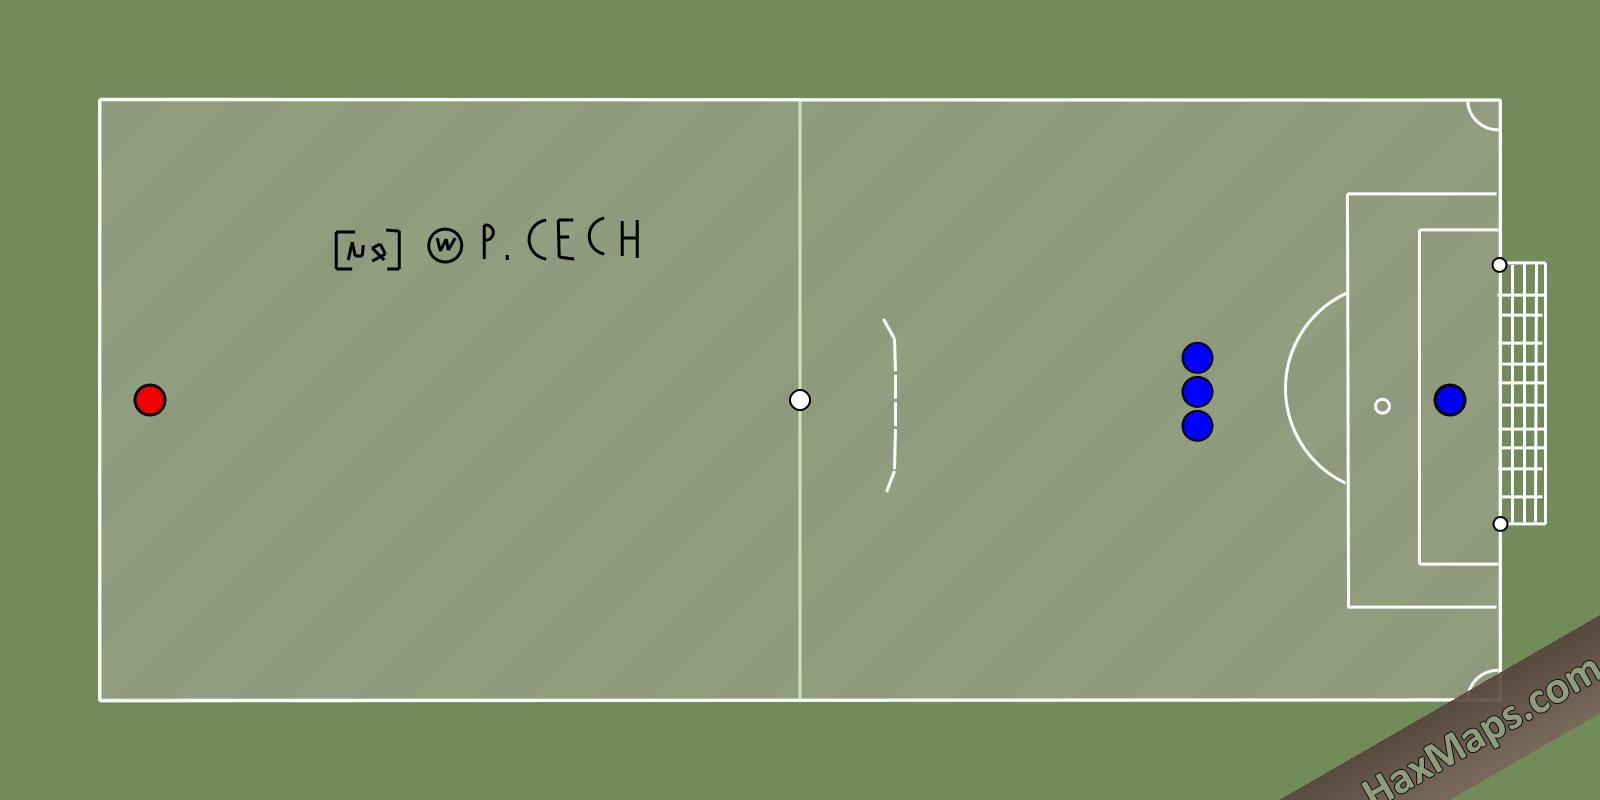 hax ball maps | asdfghjk